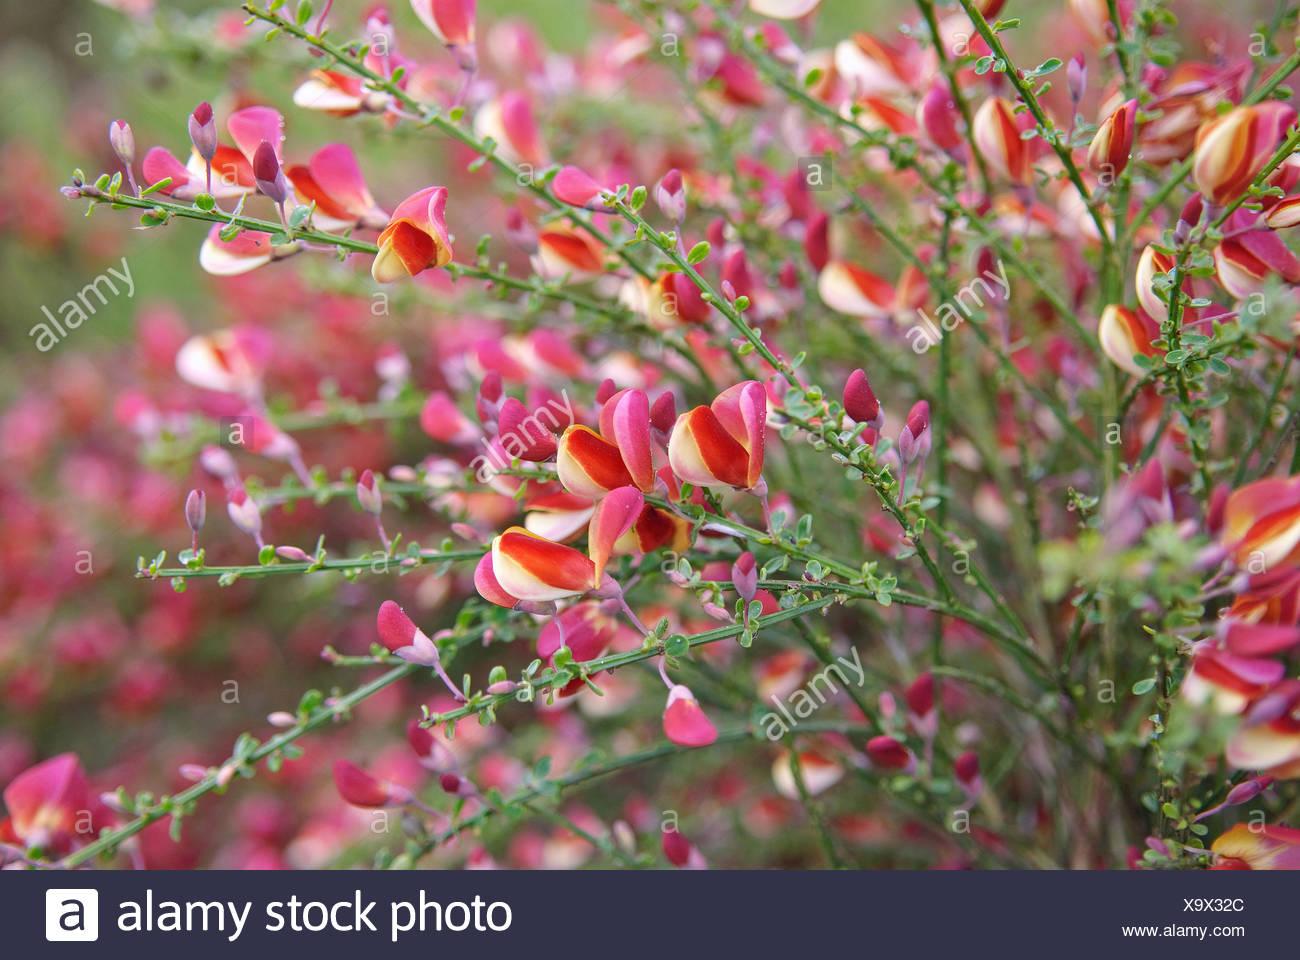 Scotch broom (Cytisus scoparius 'Red Wings', Cytisus scoparius Red Wings), cultivar Red Wings, blooming - Stock Image